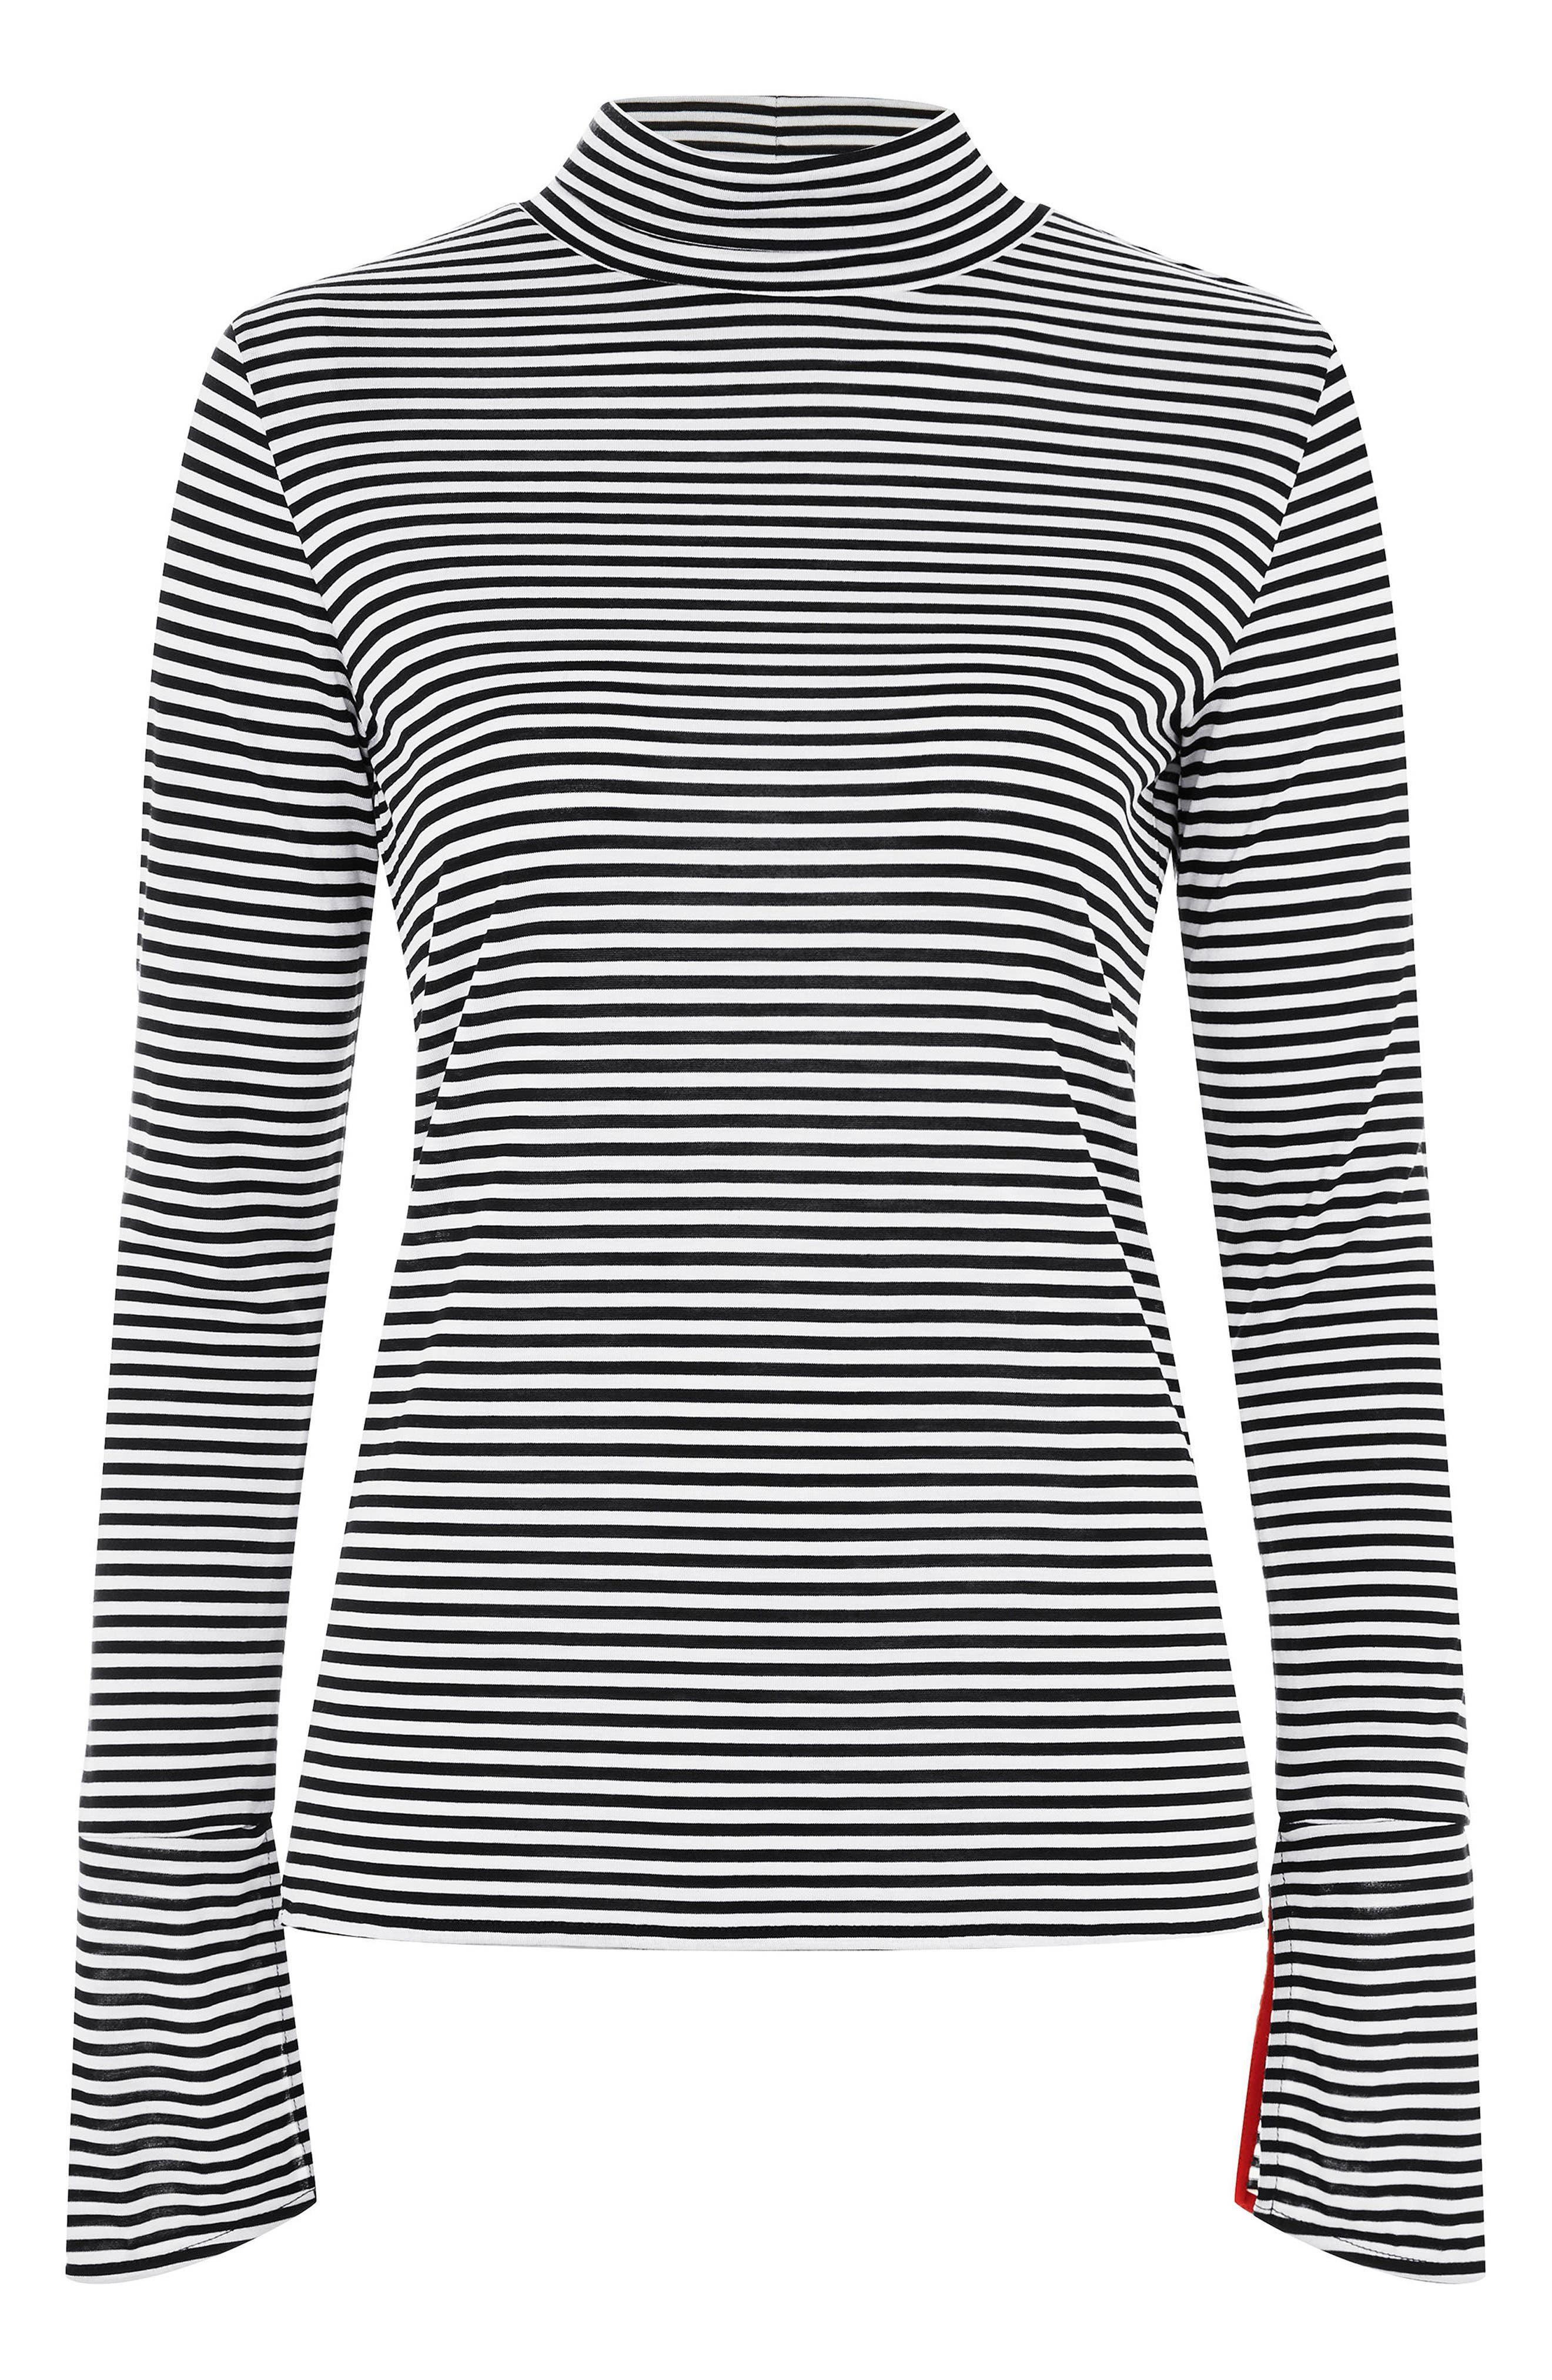 Topshop Boutique Stripe Slit Cuff Top